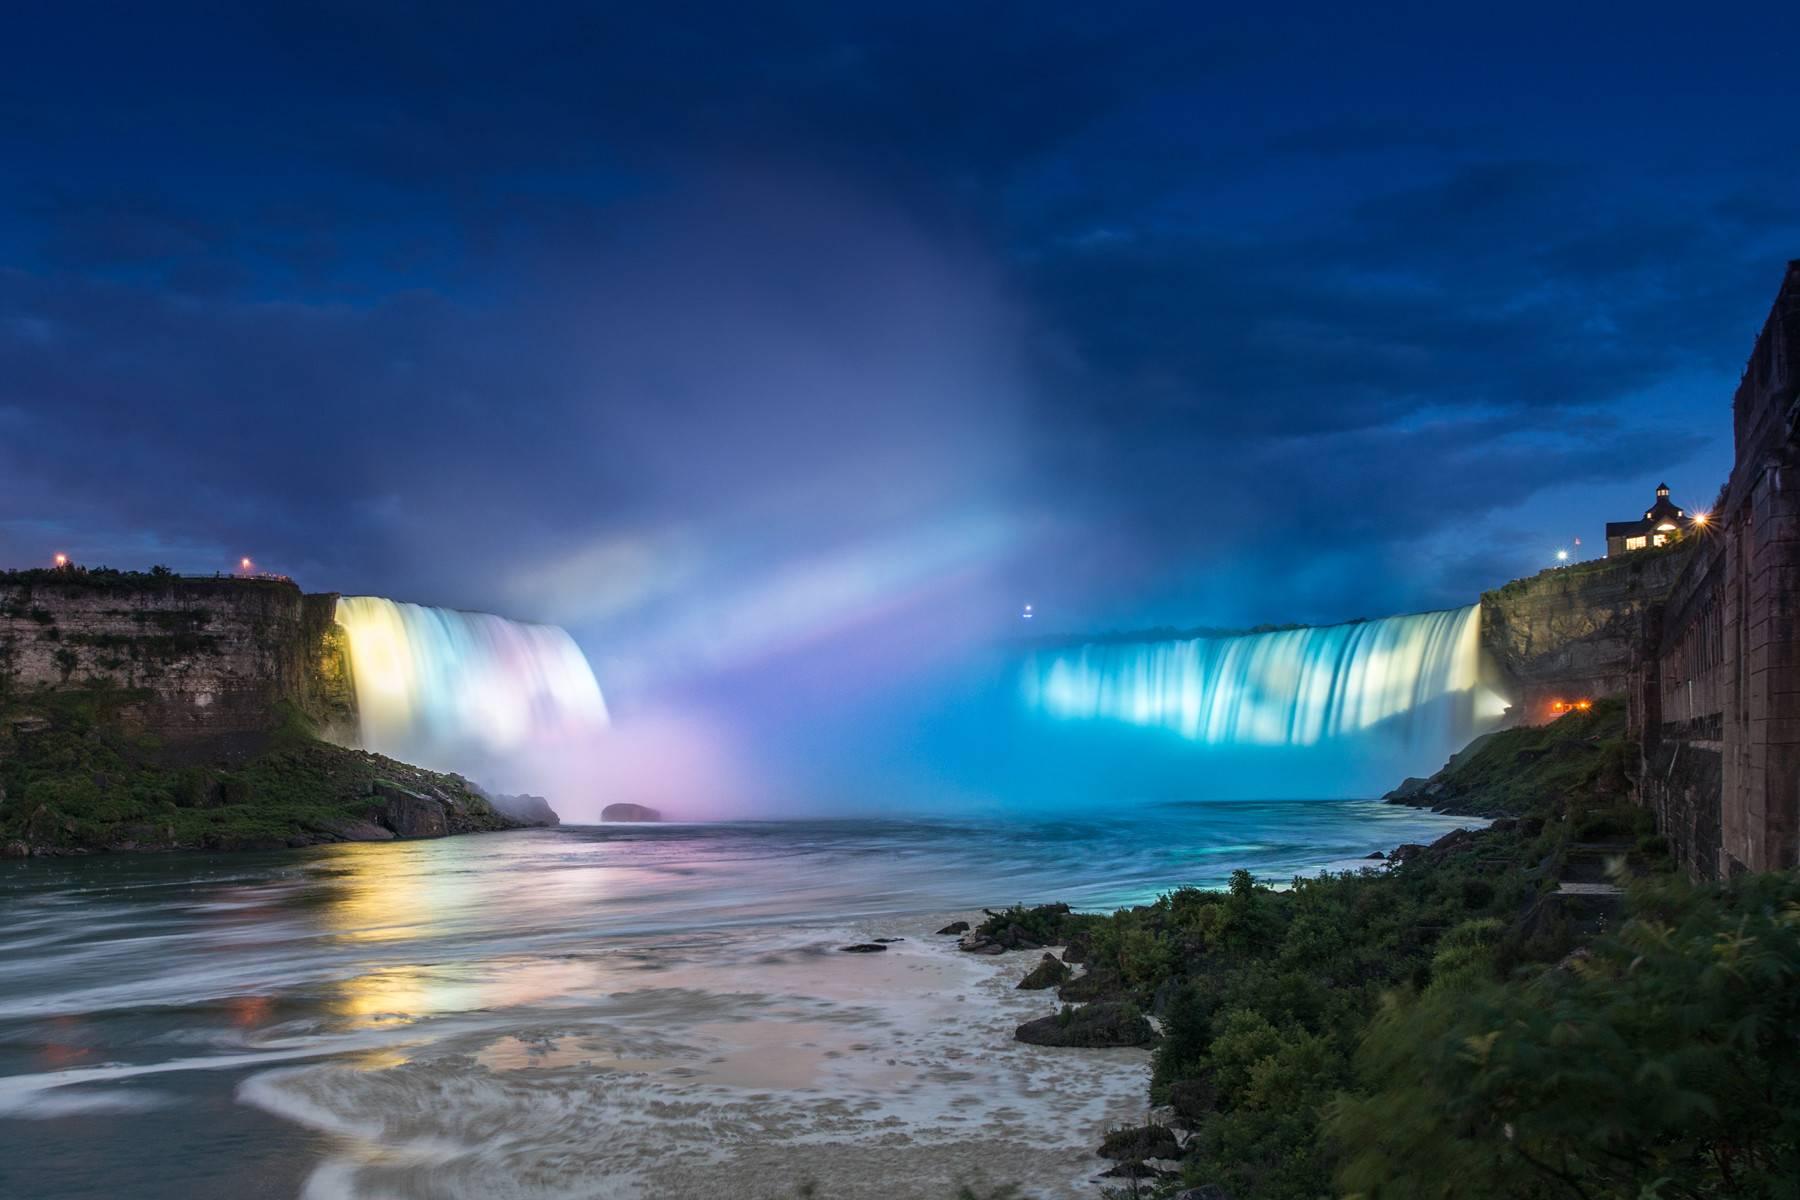 4-Day In-Depth Niagara Falls Tour From Toronto